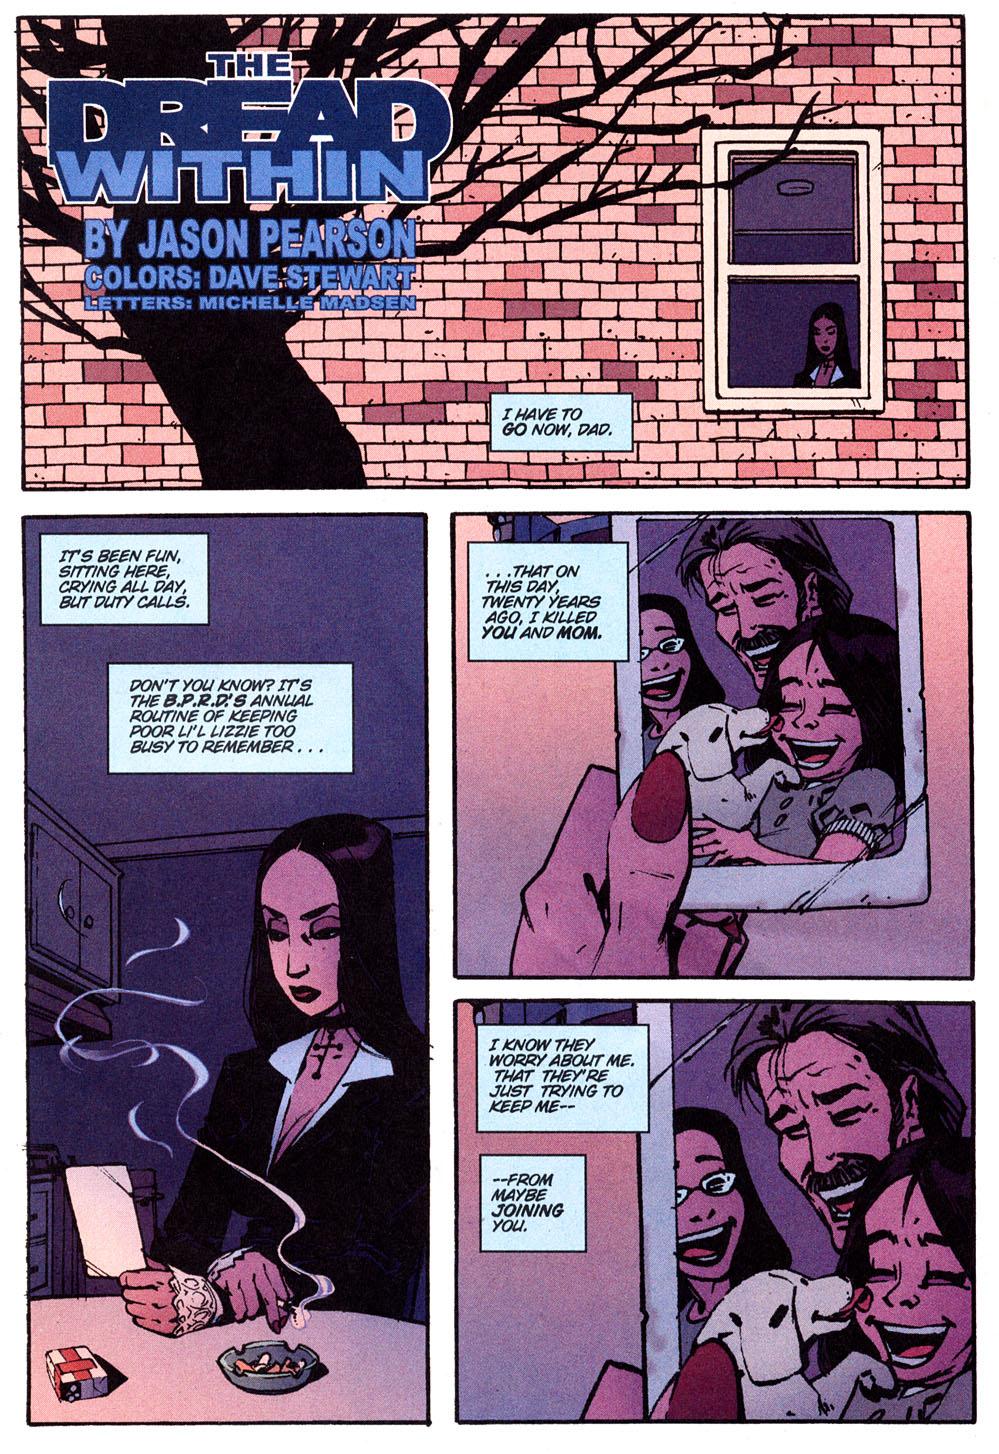 Read online Hellboy: Weird Tales comic -  Issue #4 - 3